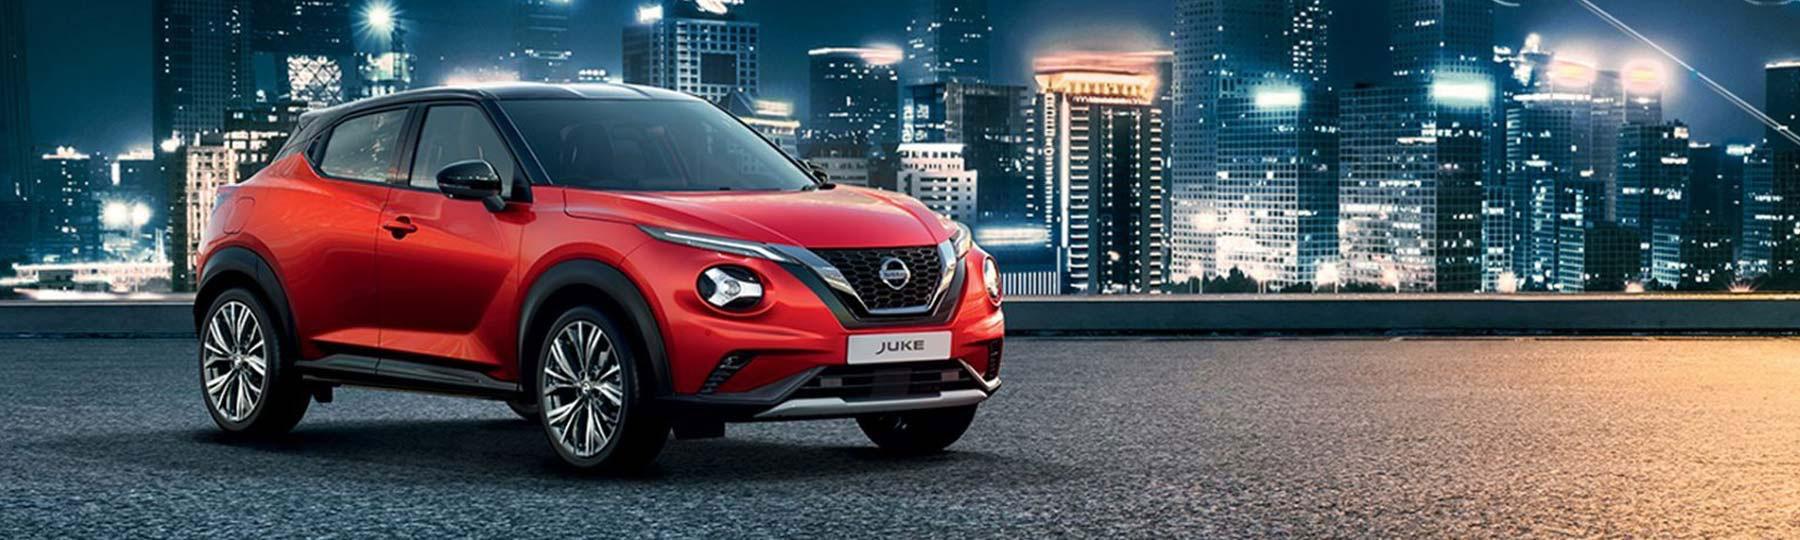 Next Generation Nissan Juke New Car Offer